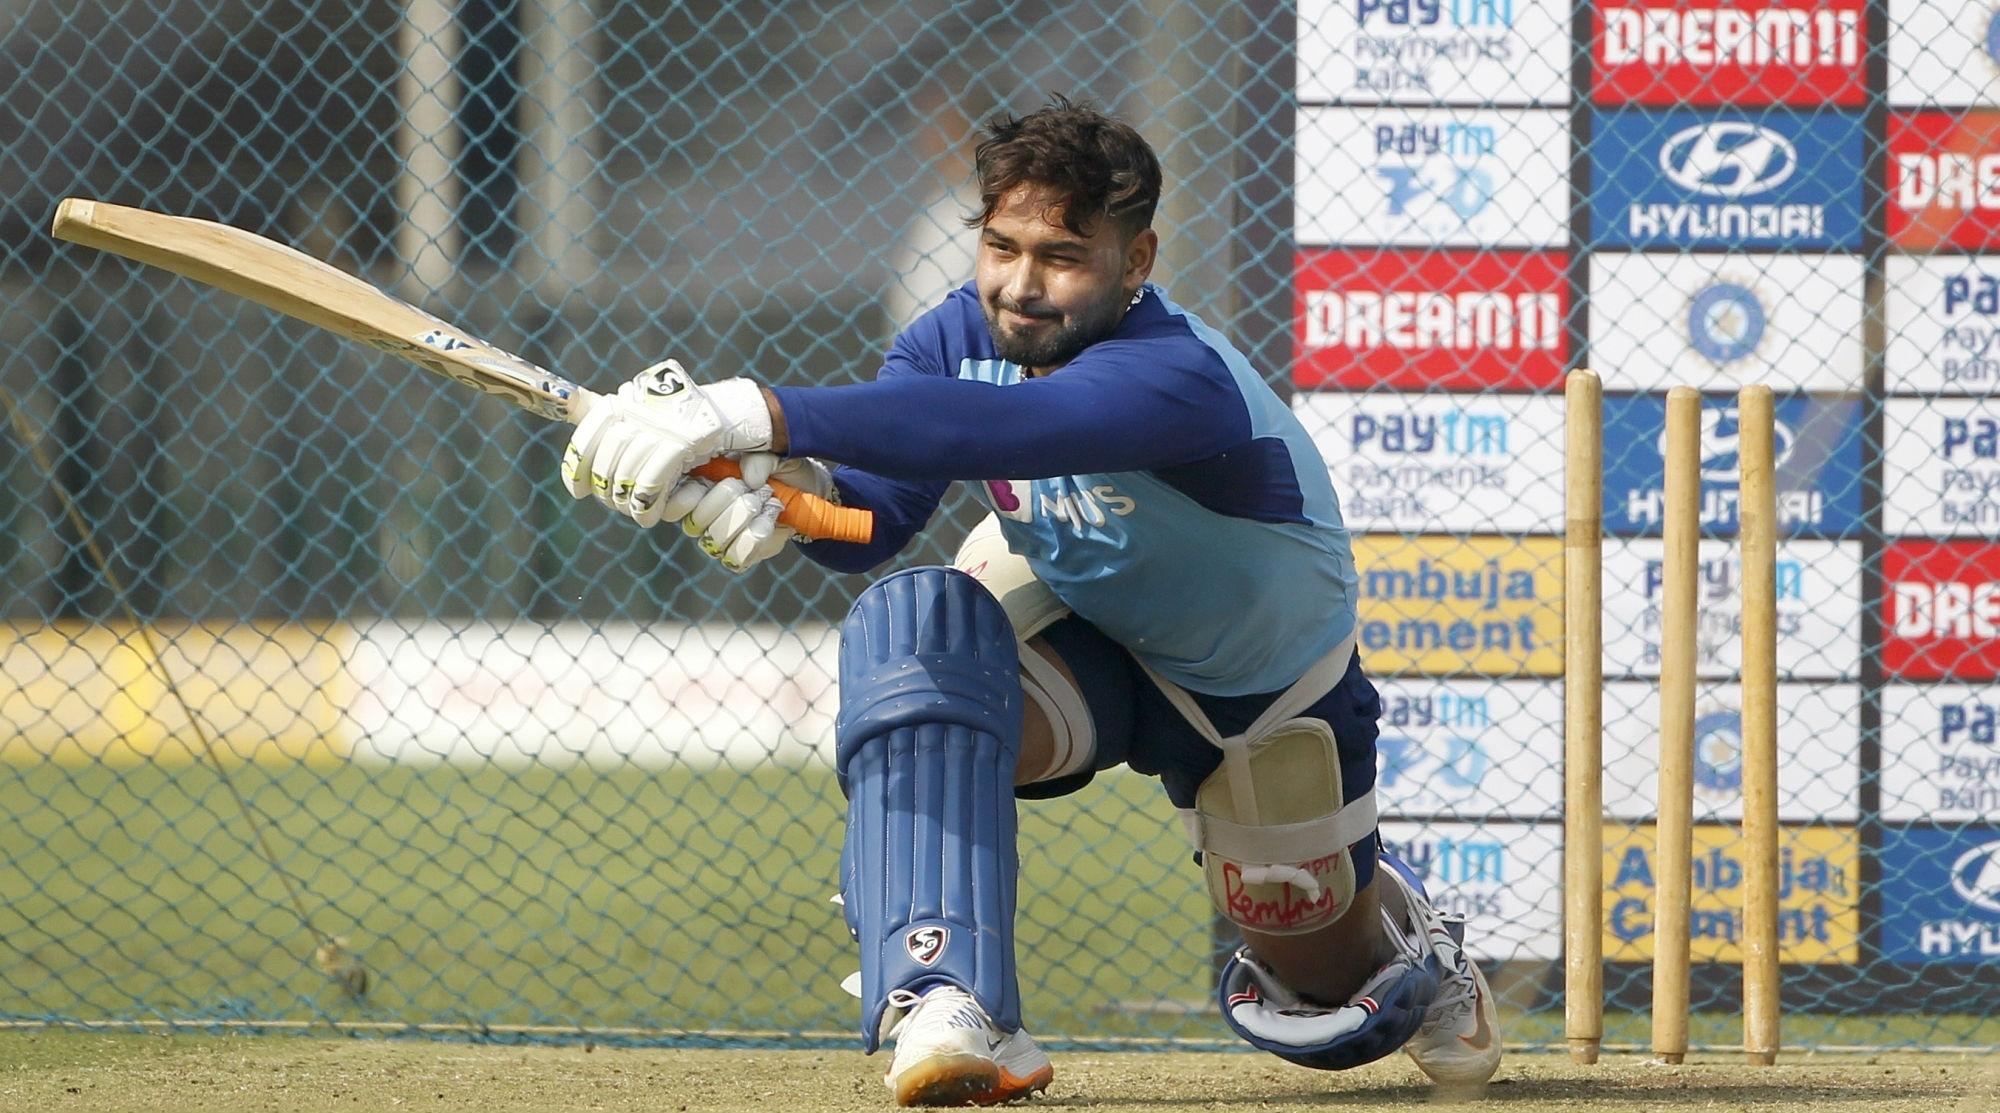 Rishabh Pant Out of India vs Australia 2nd ODI 2020, to Undergo Rehabilitation at National Cricket Academy in Bengaluru